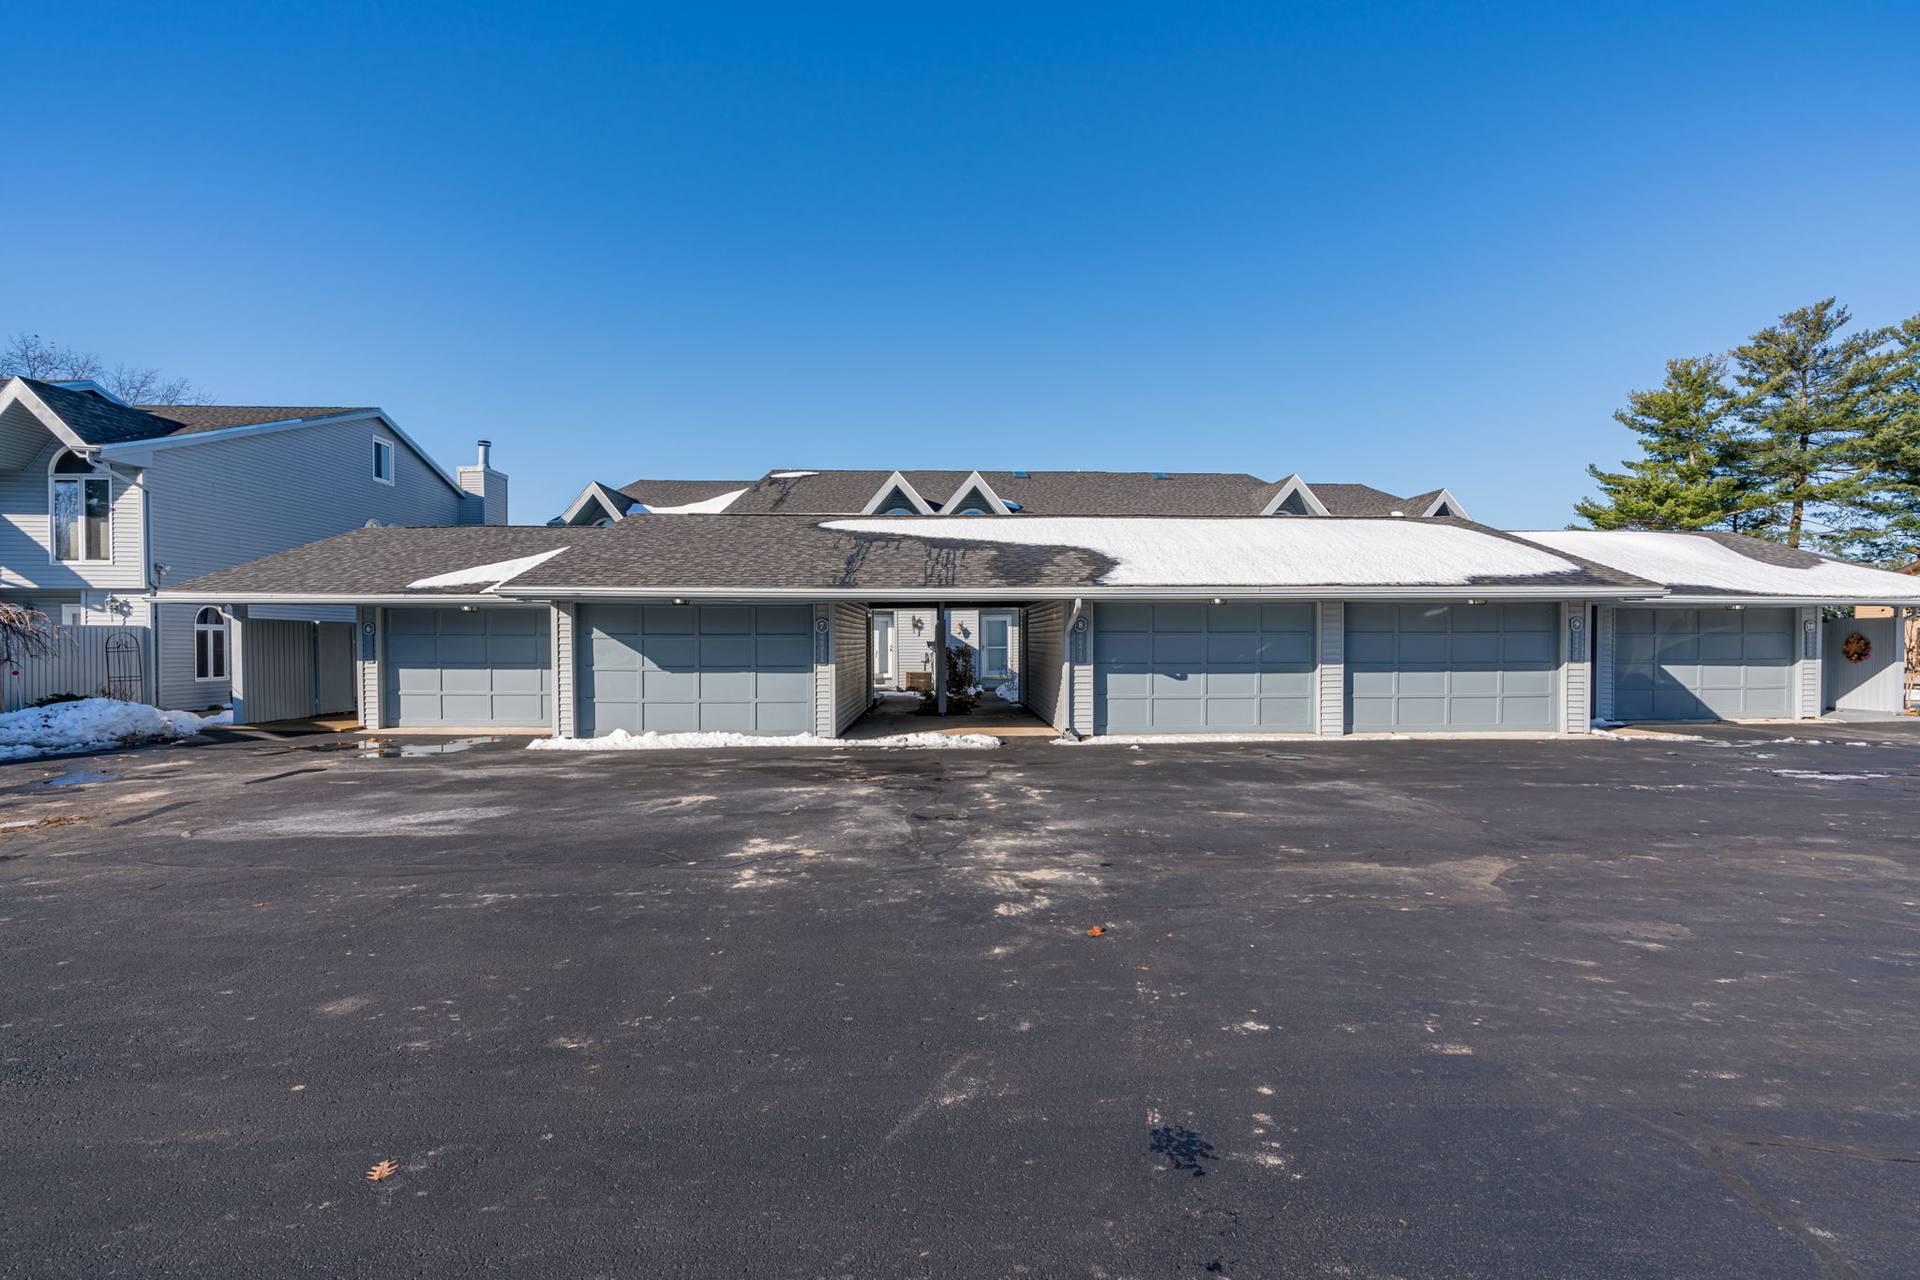 40414 Riverwood Estates Ln, Clayton, NY 13624, US